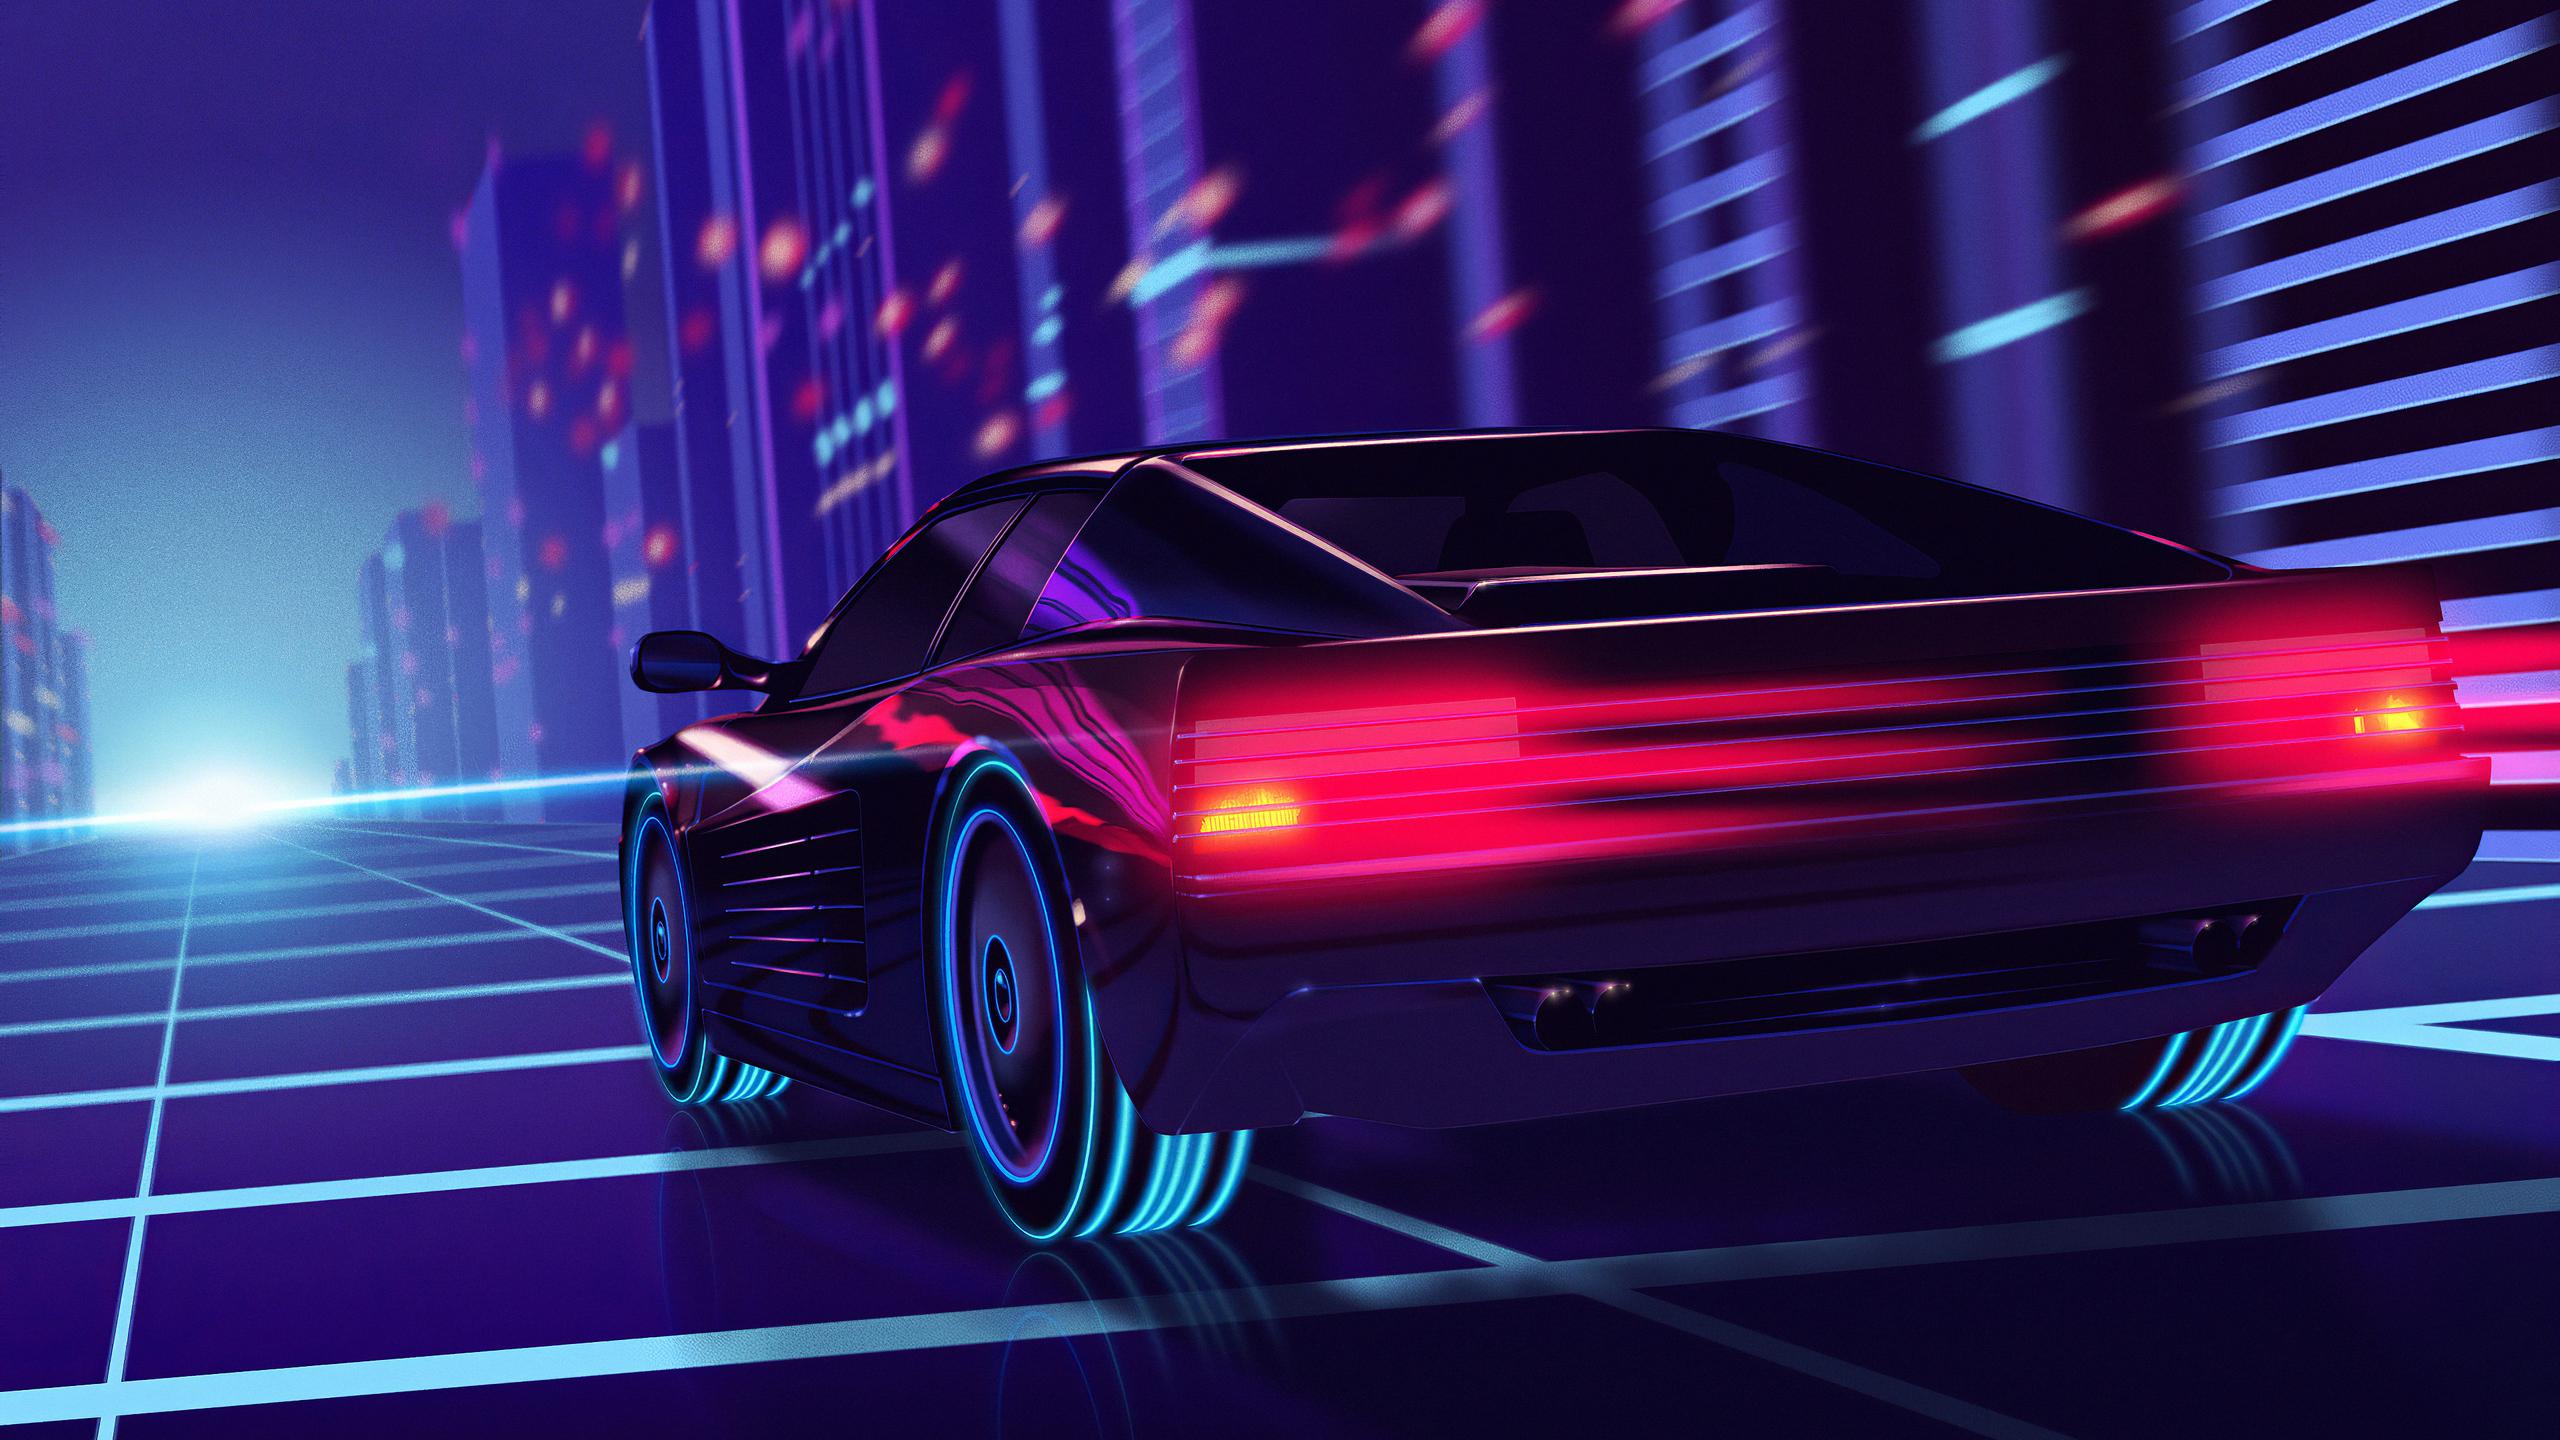 2560x1440 Cyber Car Neon City 1440P Resolution HD 4k ...